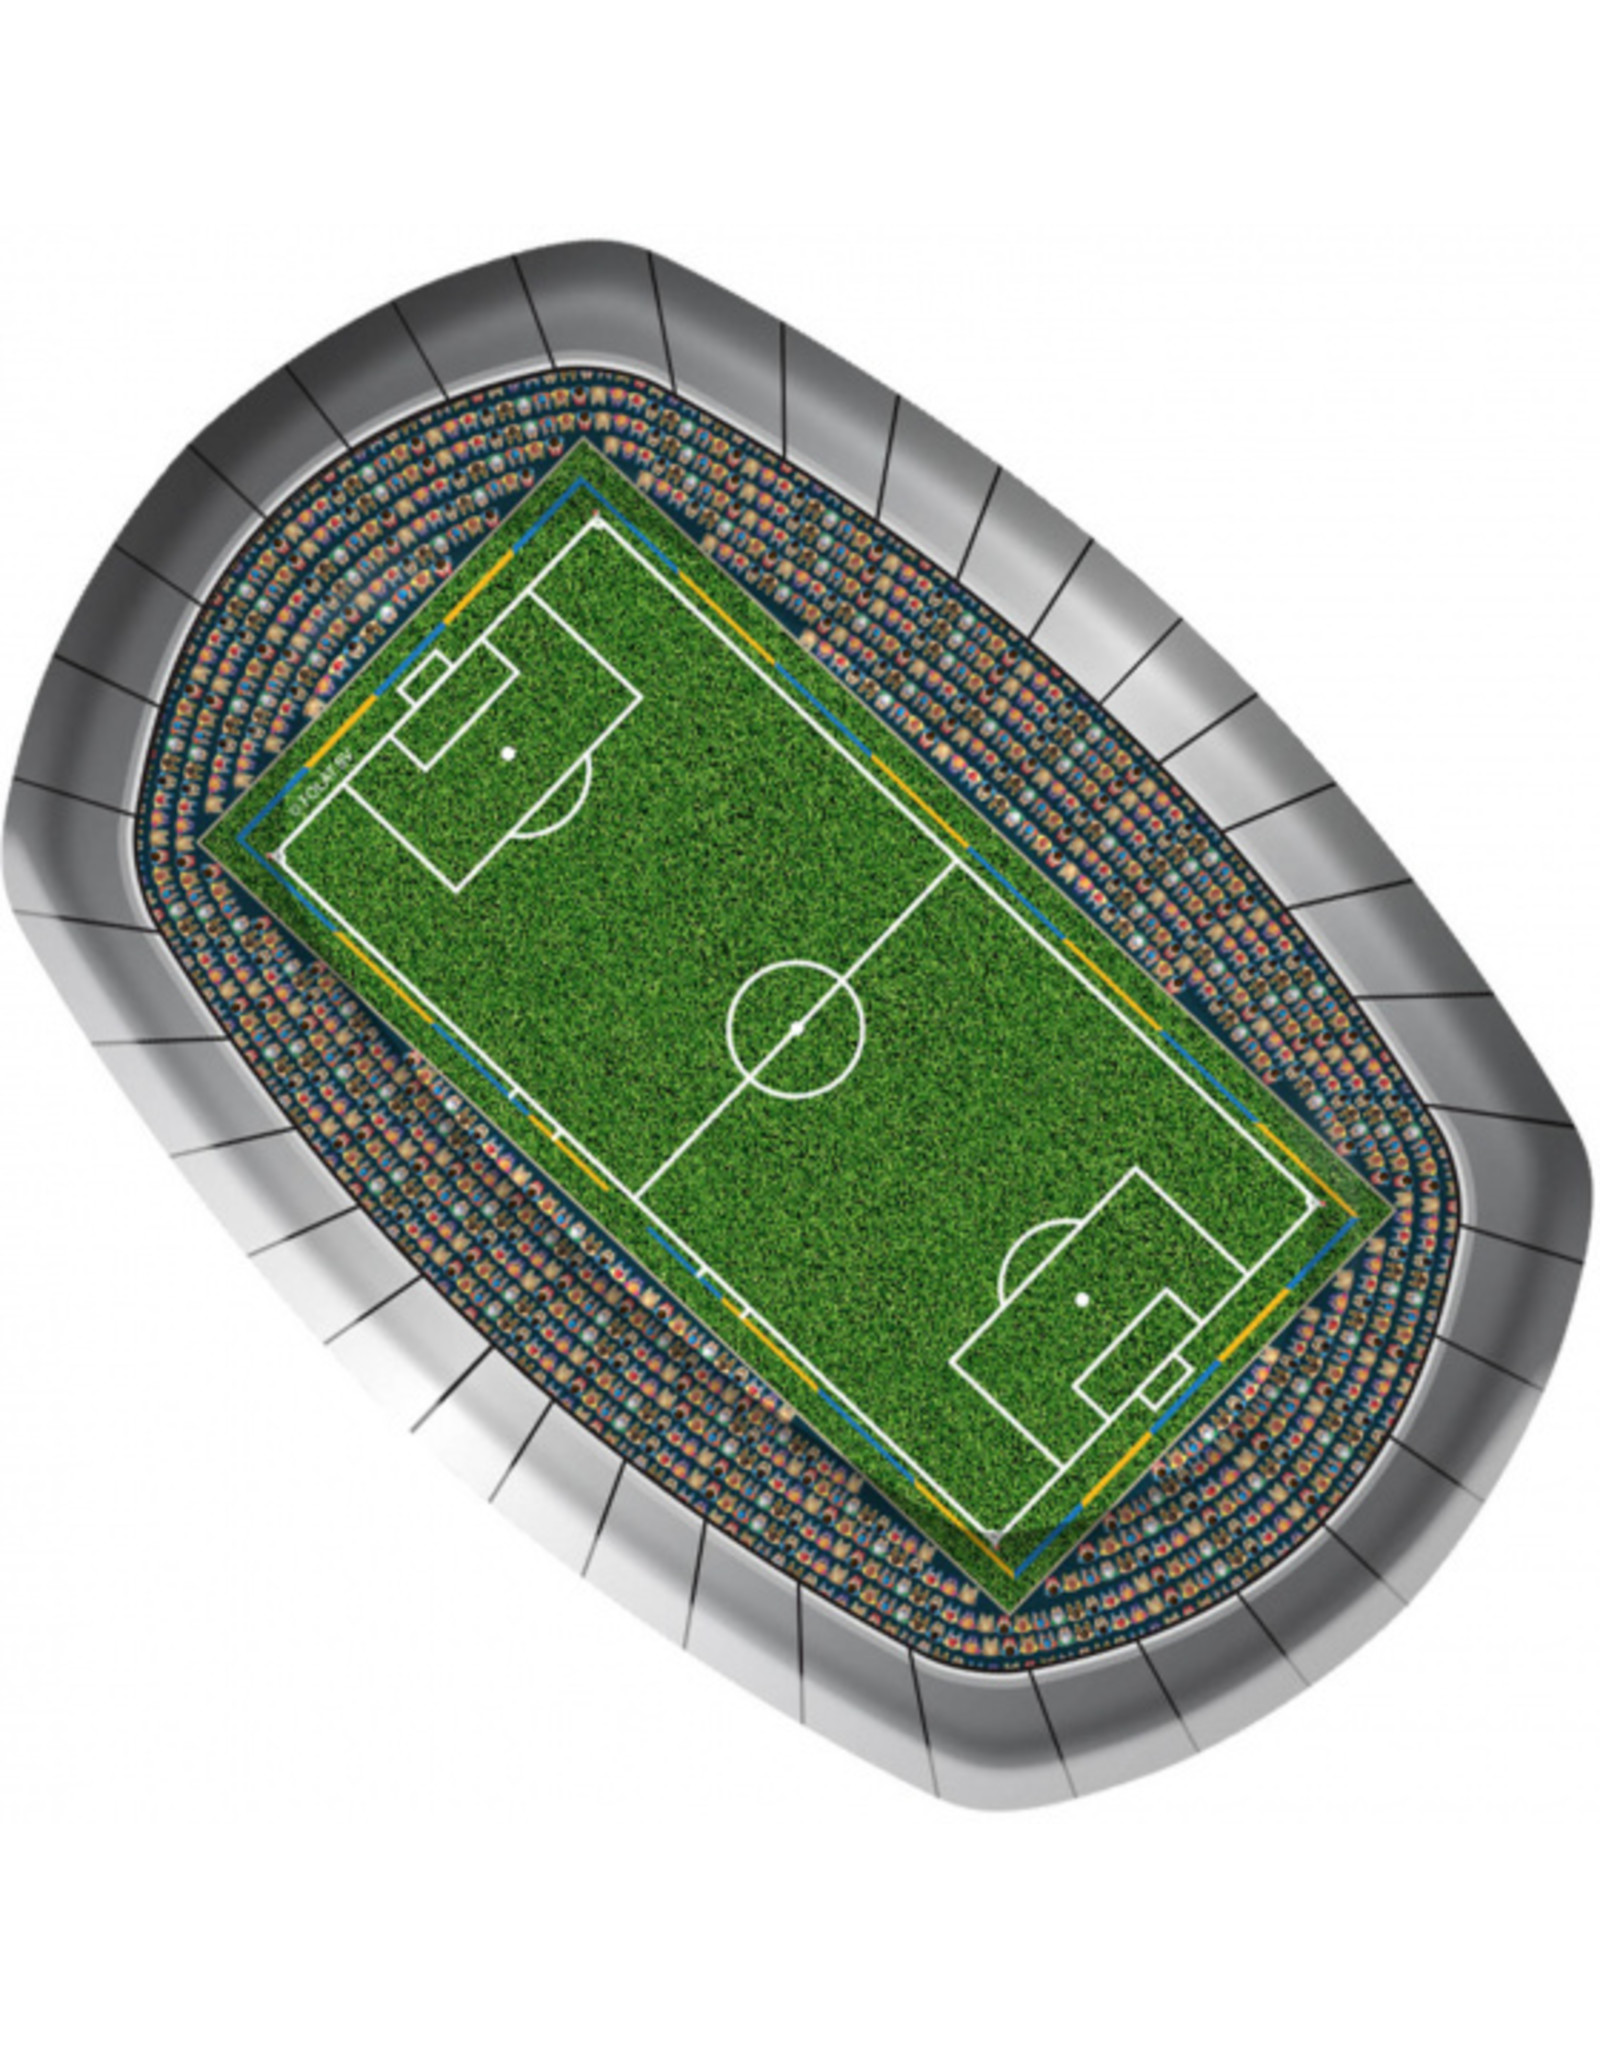 8 voetbalstadion bordjes